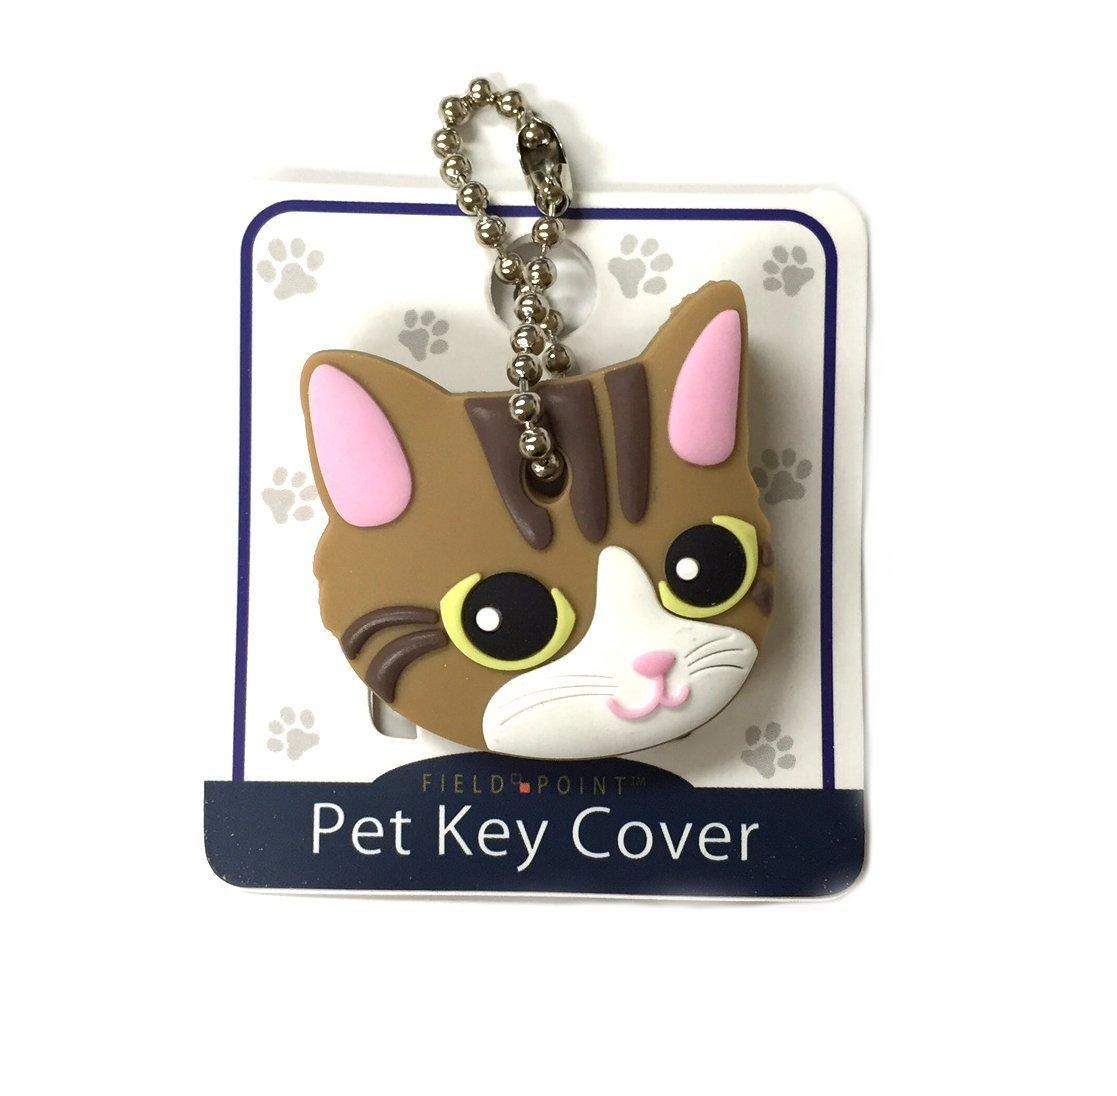 Key Cover / Key Caps / Key Holder / Keycaps - Cute Animal Pet Faces (Black Cat) Field Point FBA_FS2805 FS2808 FS2810